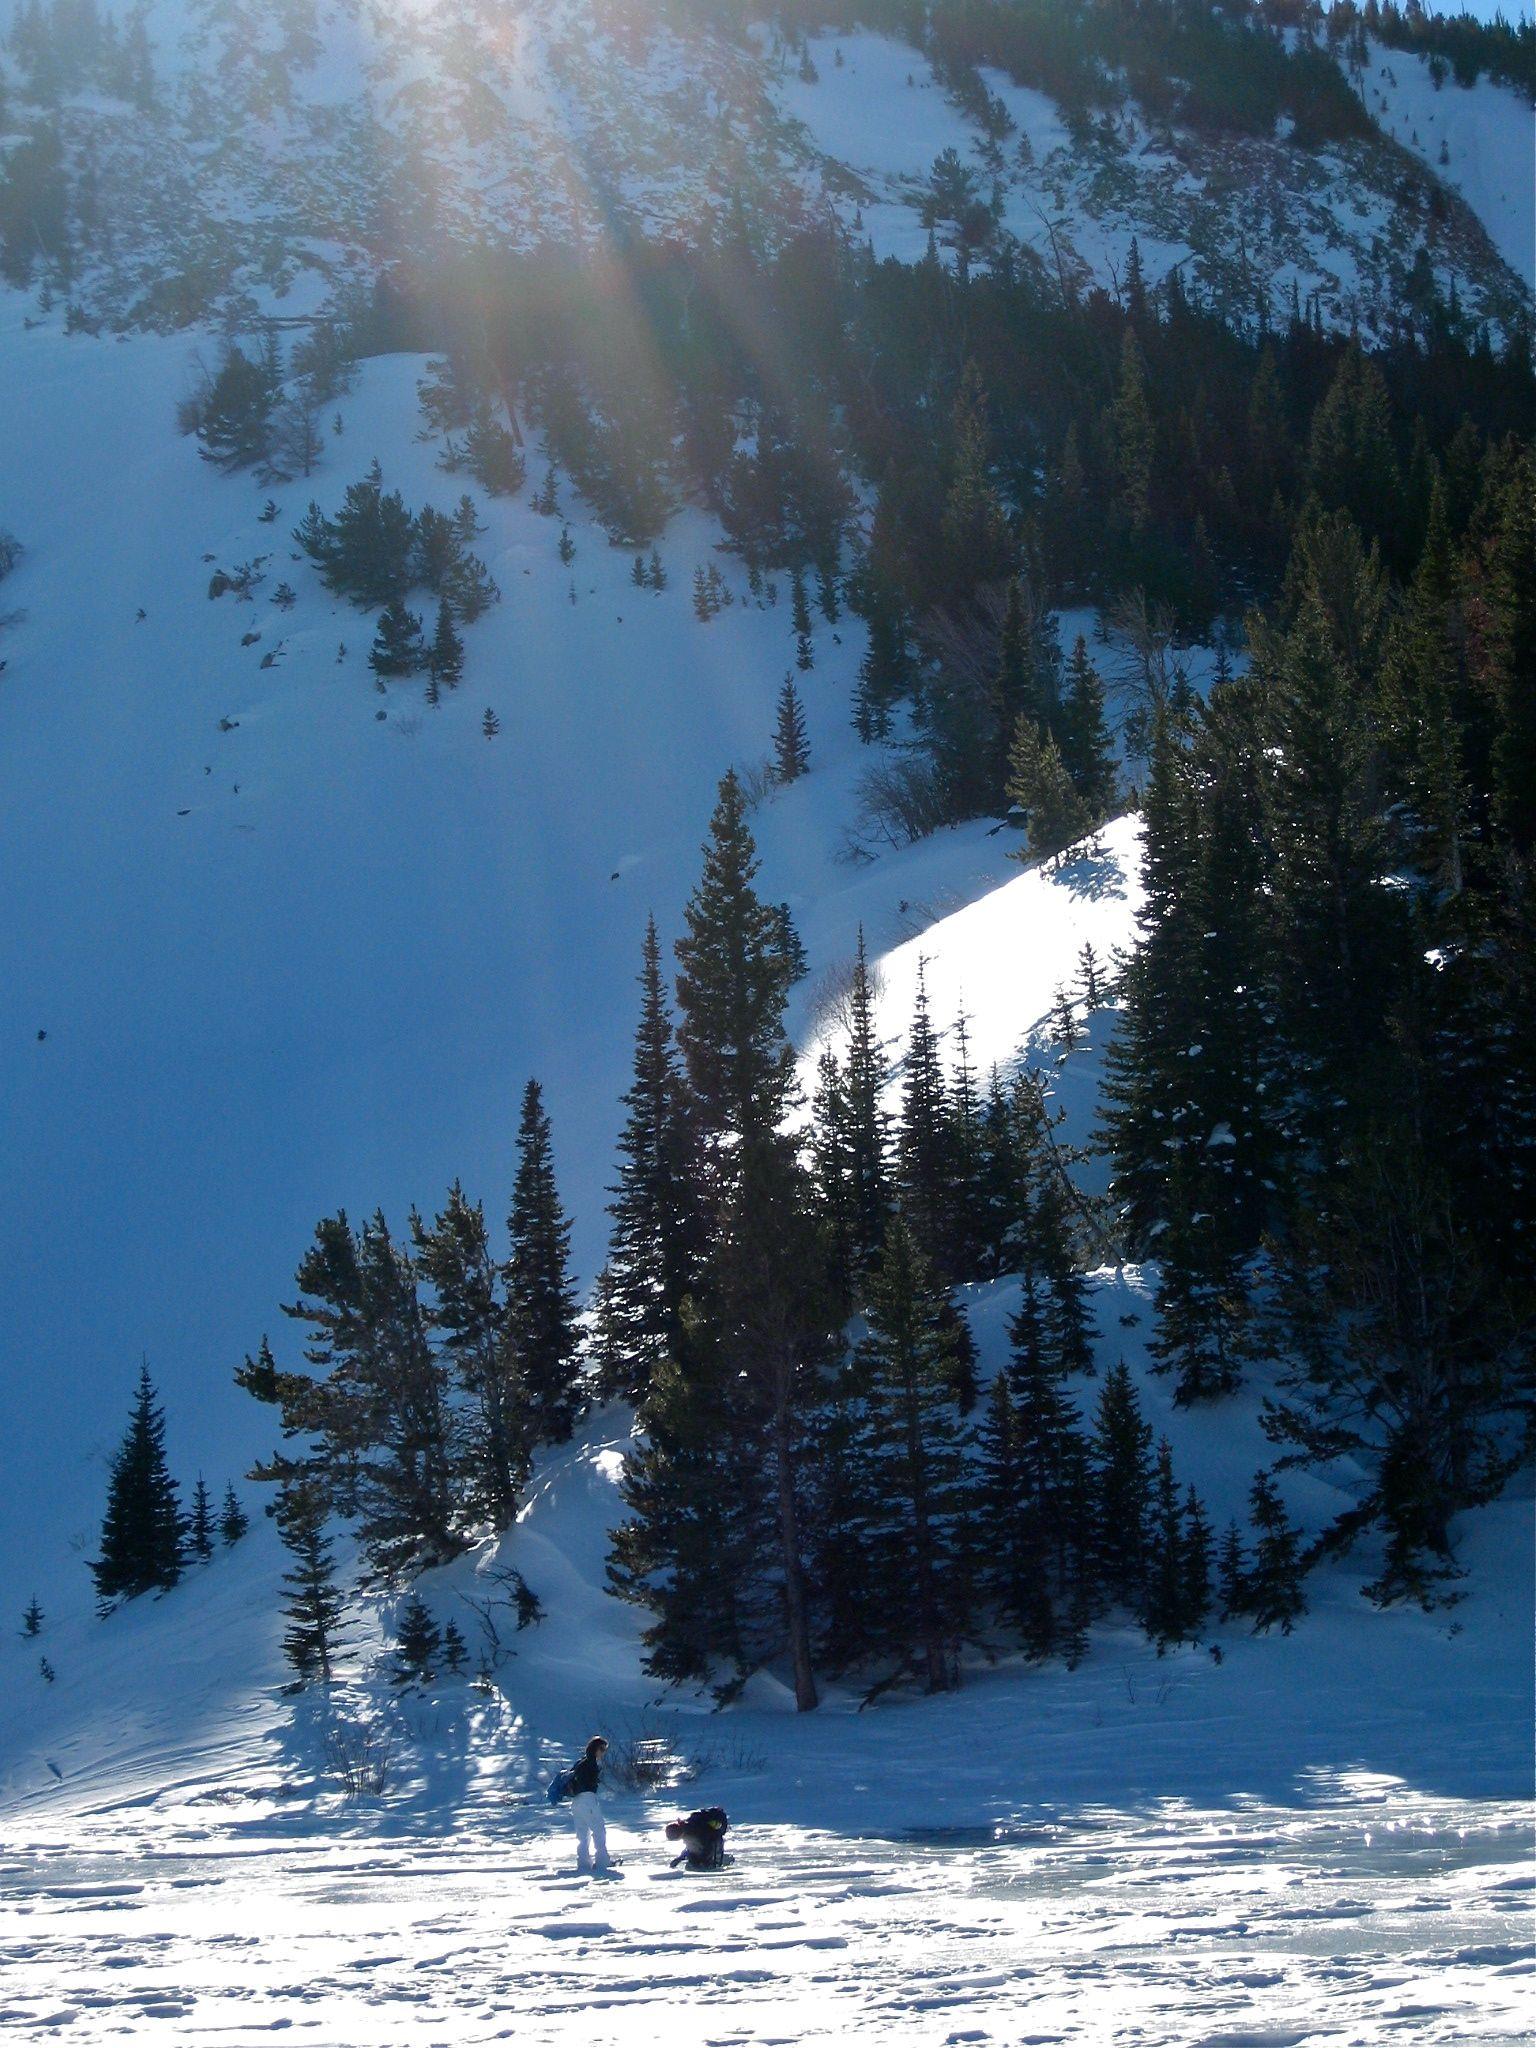 snowy tree.jpg